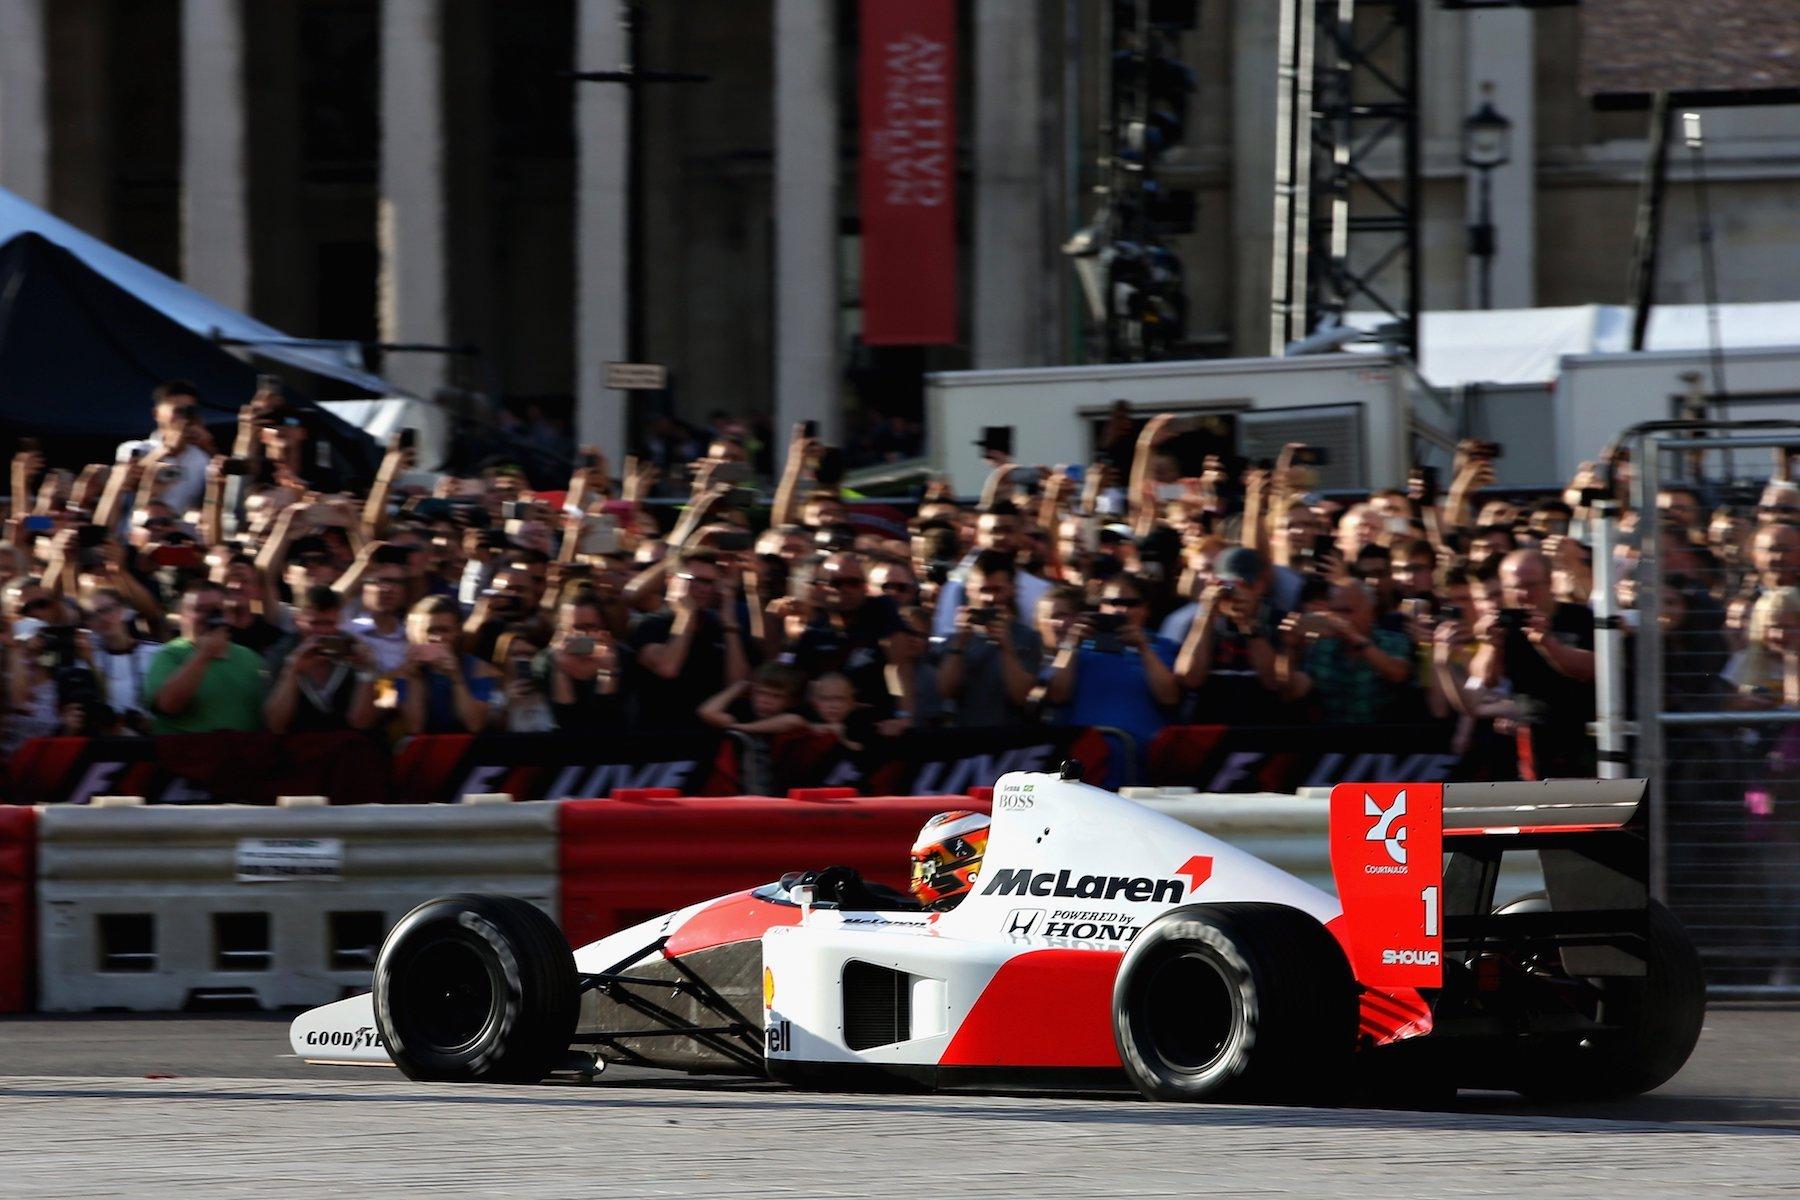 2017 F1 Live London 7 copy.jpg